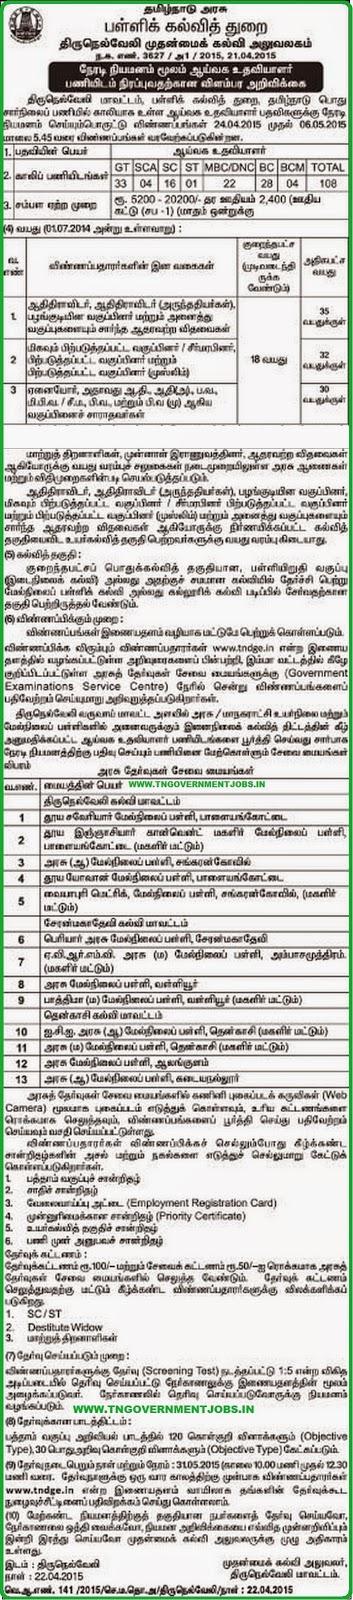 Tirunelveli District CEO Lab Asst Recruitments 2015 (www.tngovernmentjobs.in)